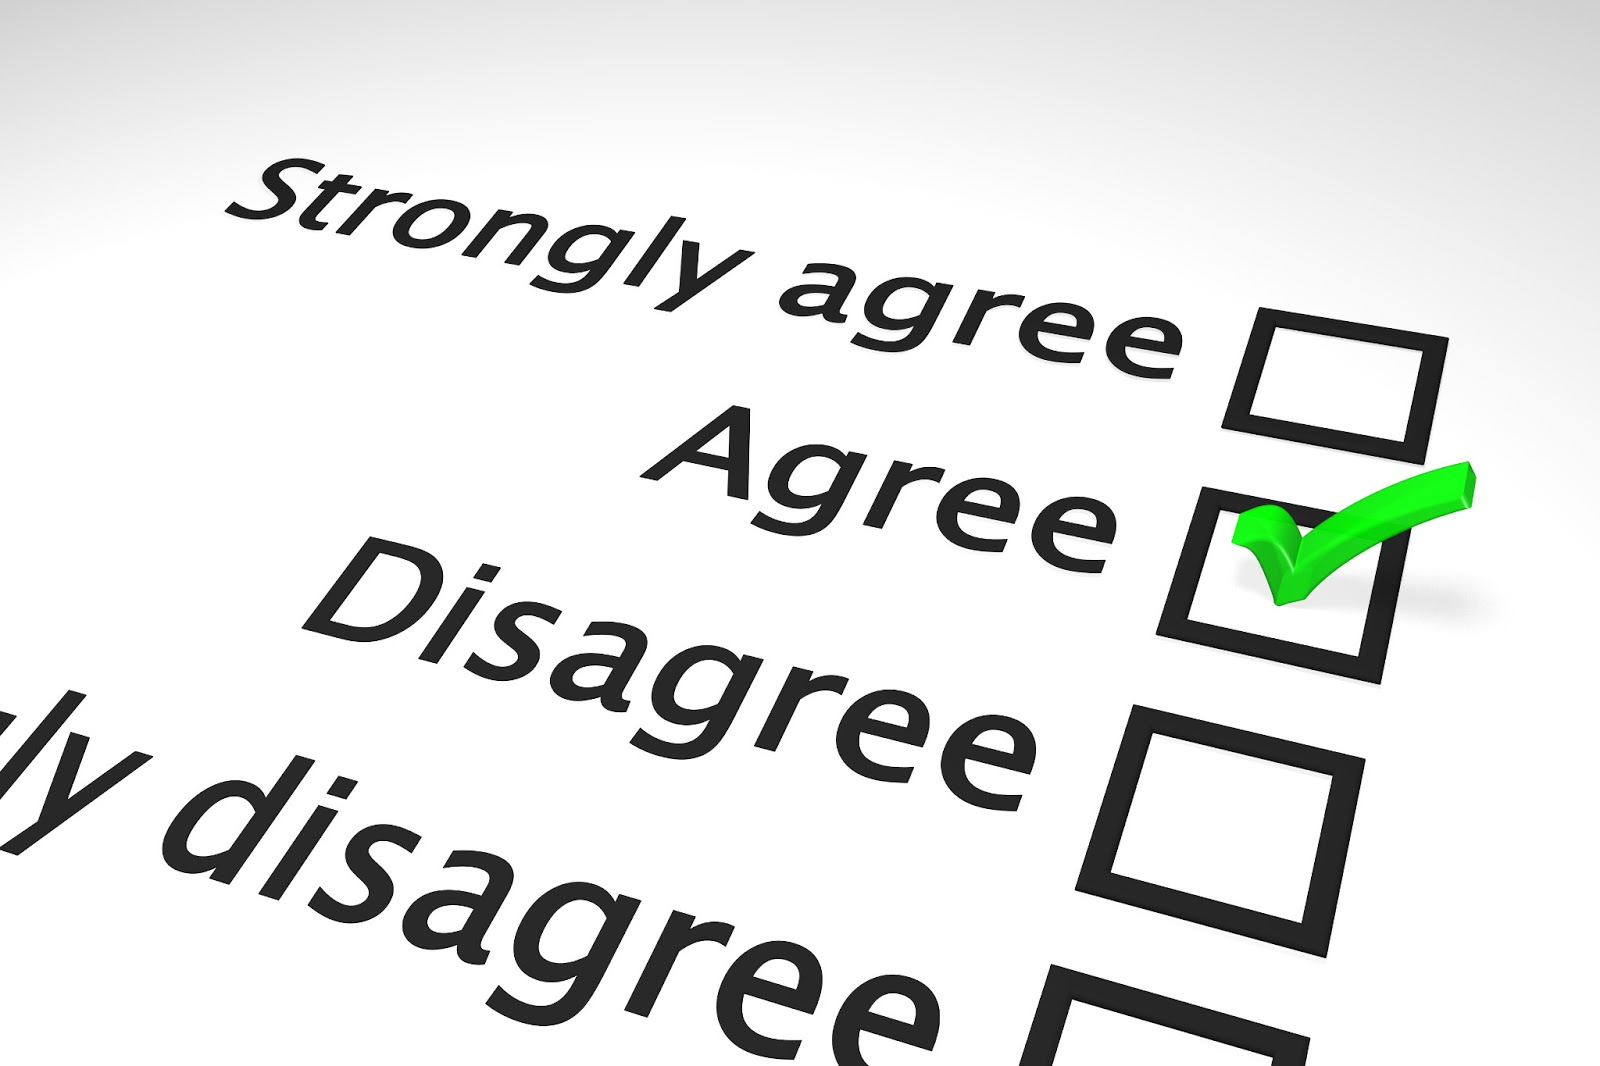 SurveyAgreeDisagree